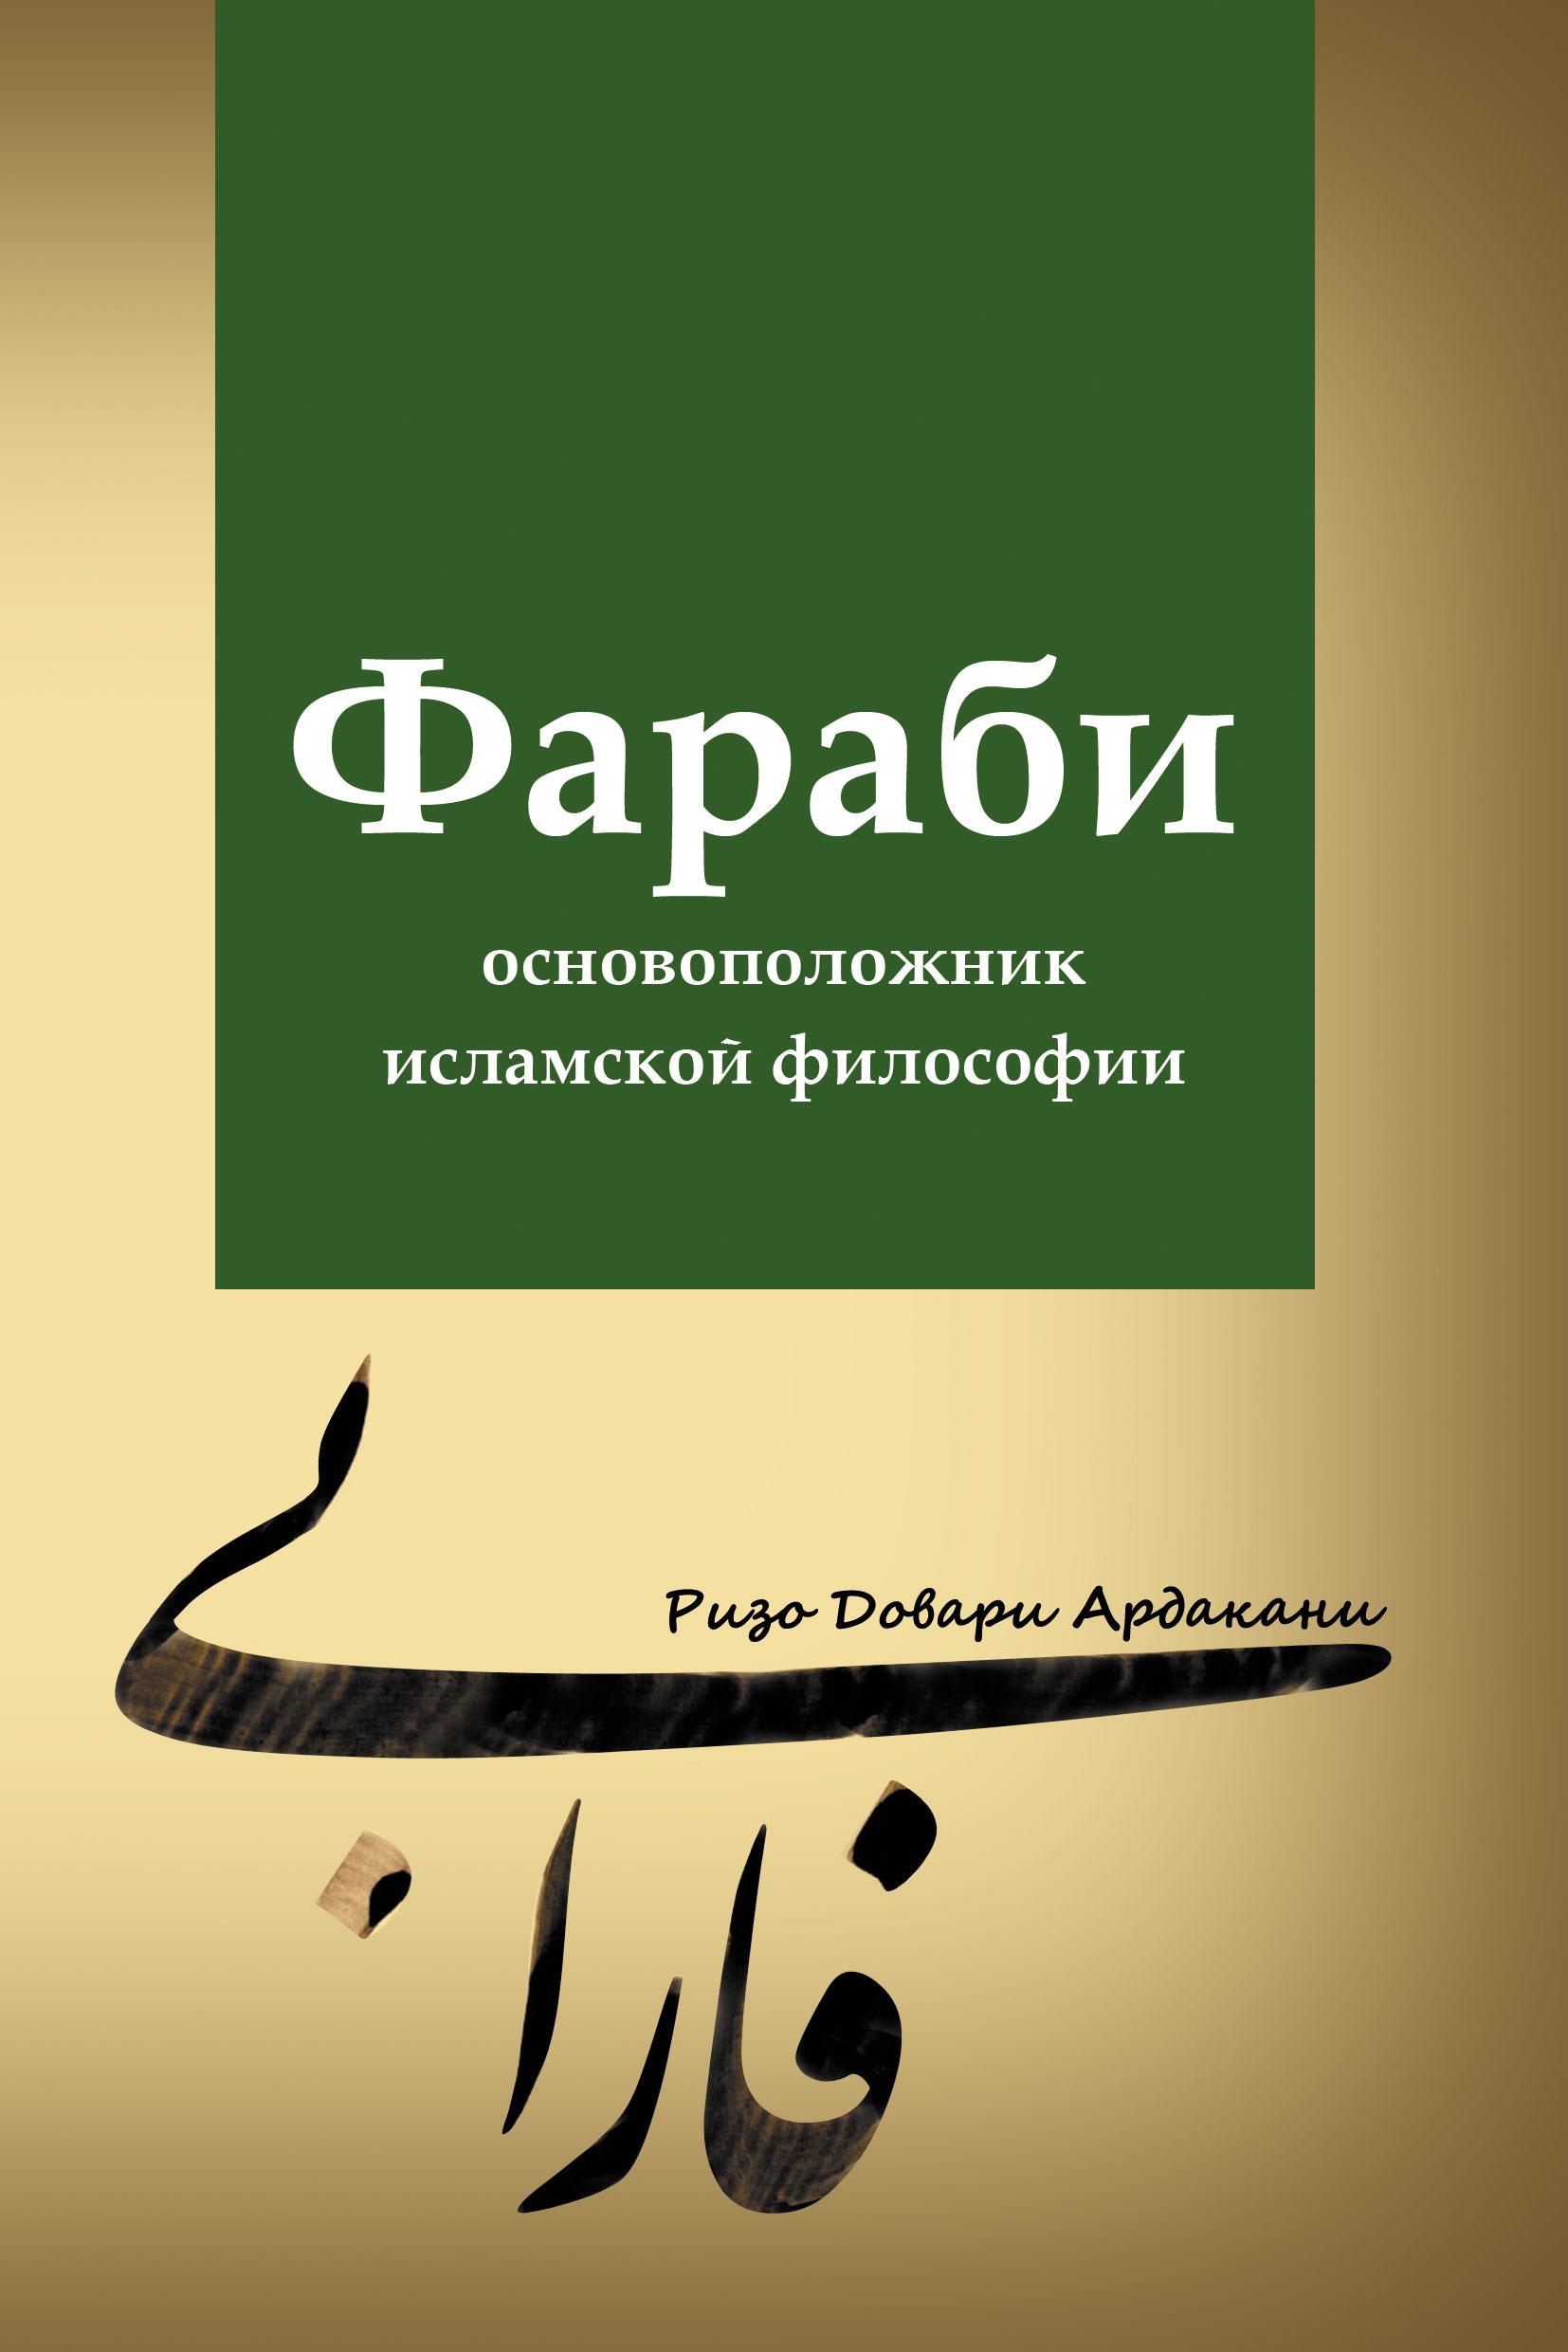 Ризо Довари Ардакани Фараби – основоположник исламской философии м хайруллаев фараби эпоха и учение